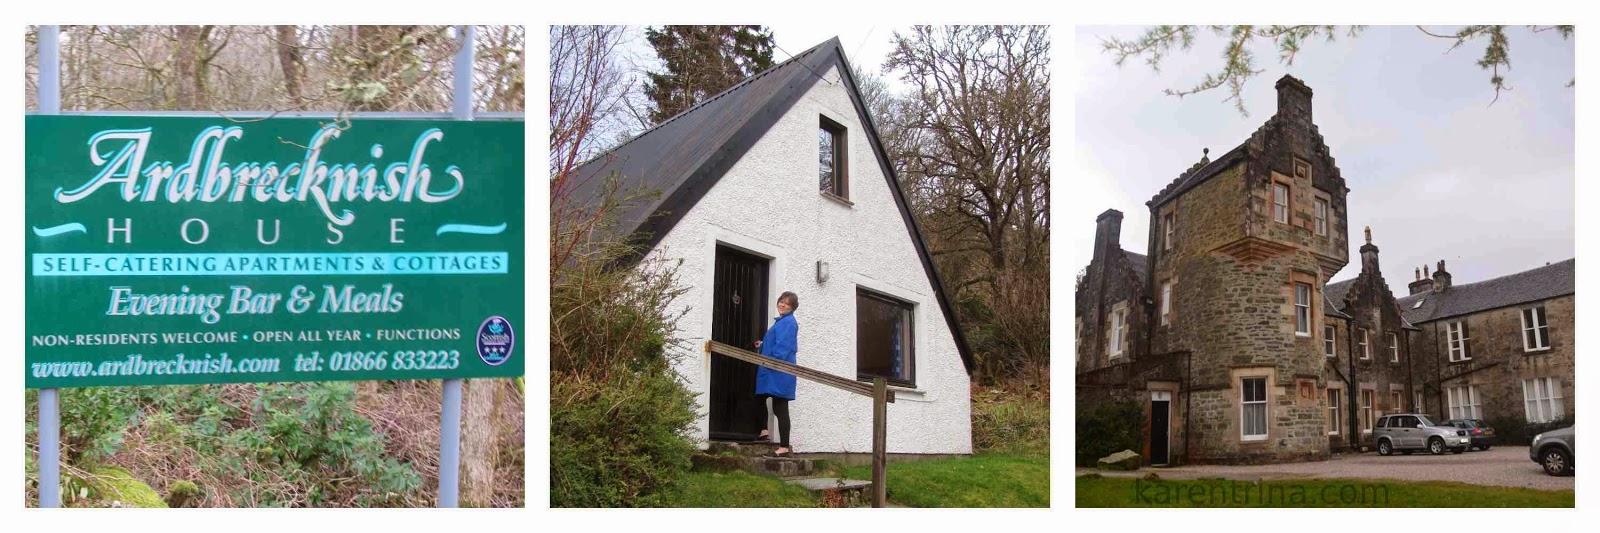 Ardbrecknish House